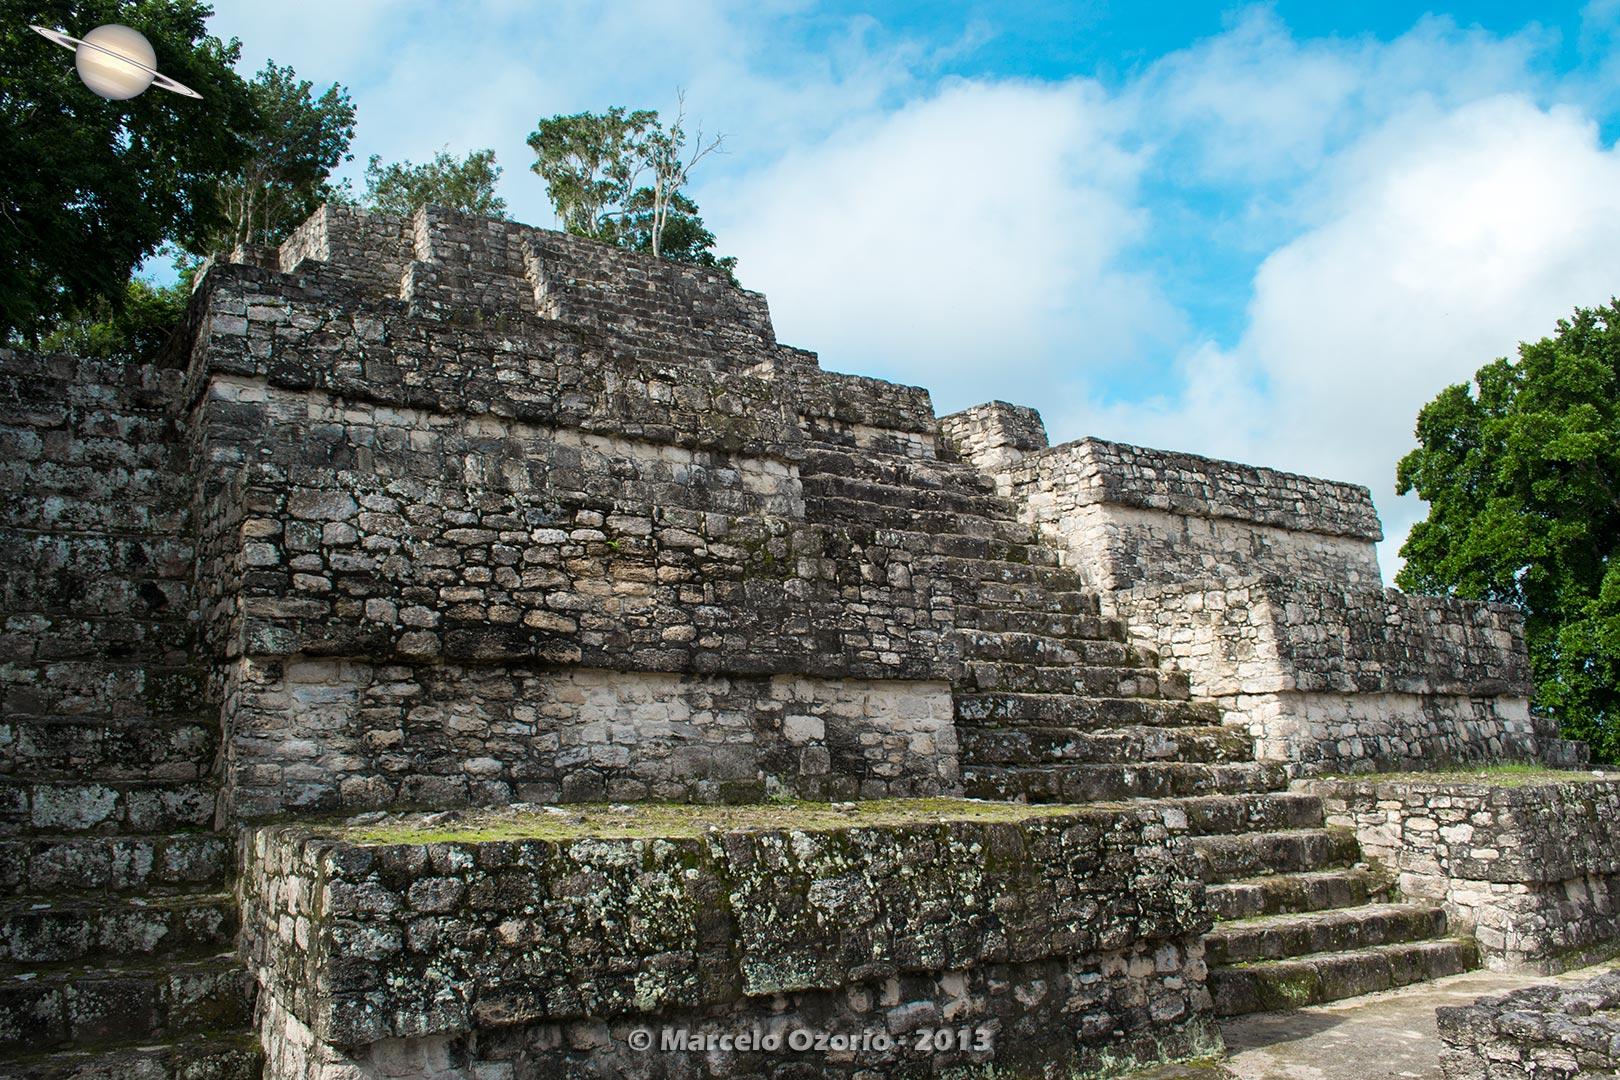 calakmul mayan civilization mexico 15 - Calakmul, City of the Two Adjacent Pyramids - Mexico